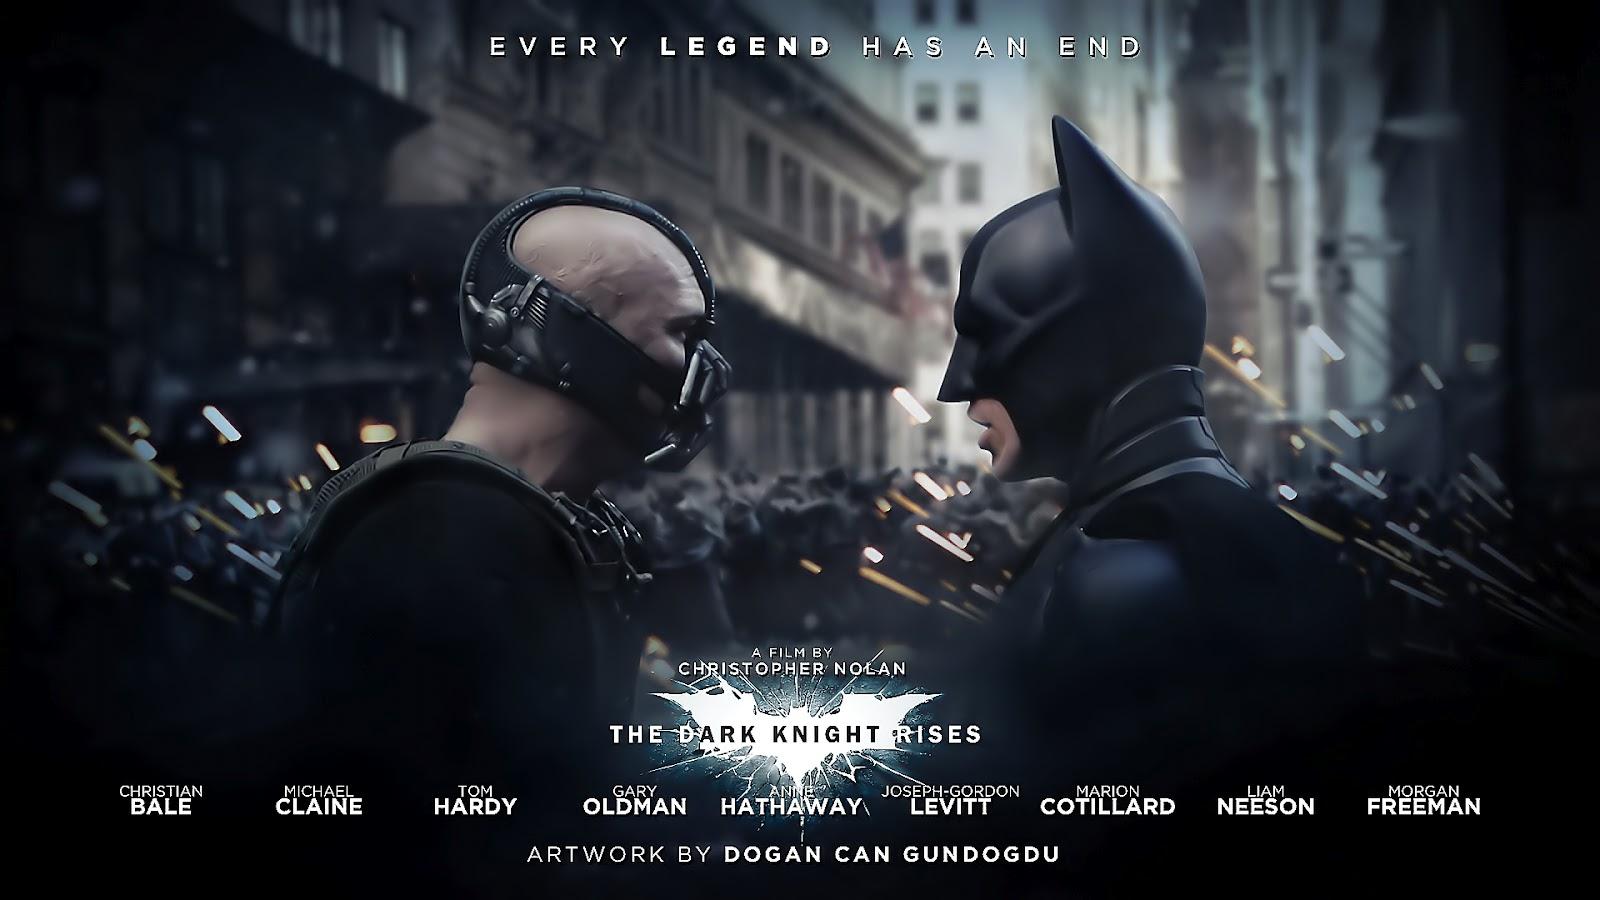 The Dark Knight Rises HD wallpapers Batman movie